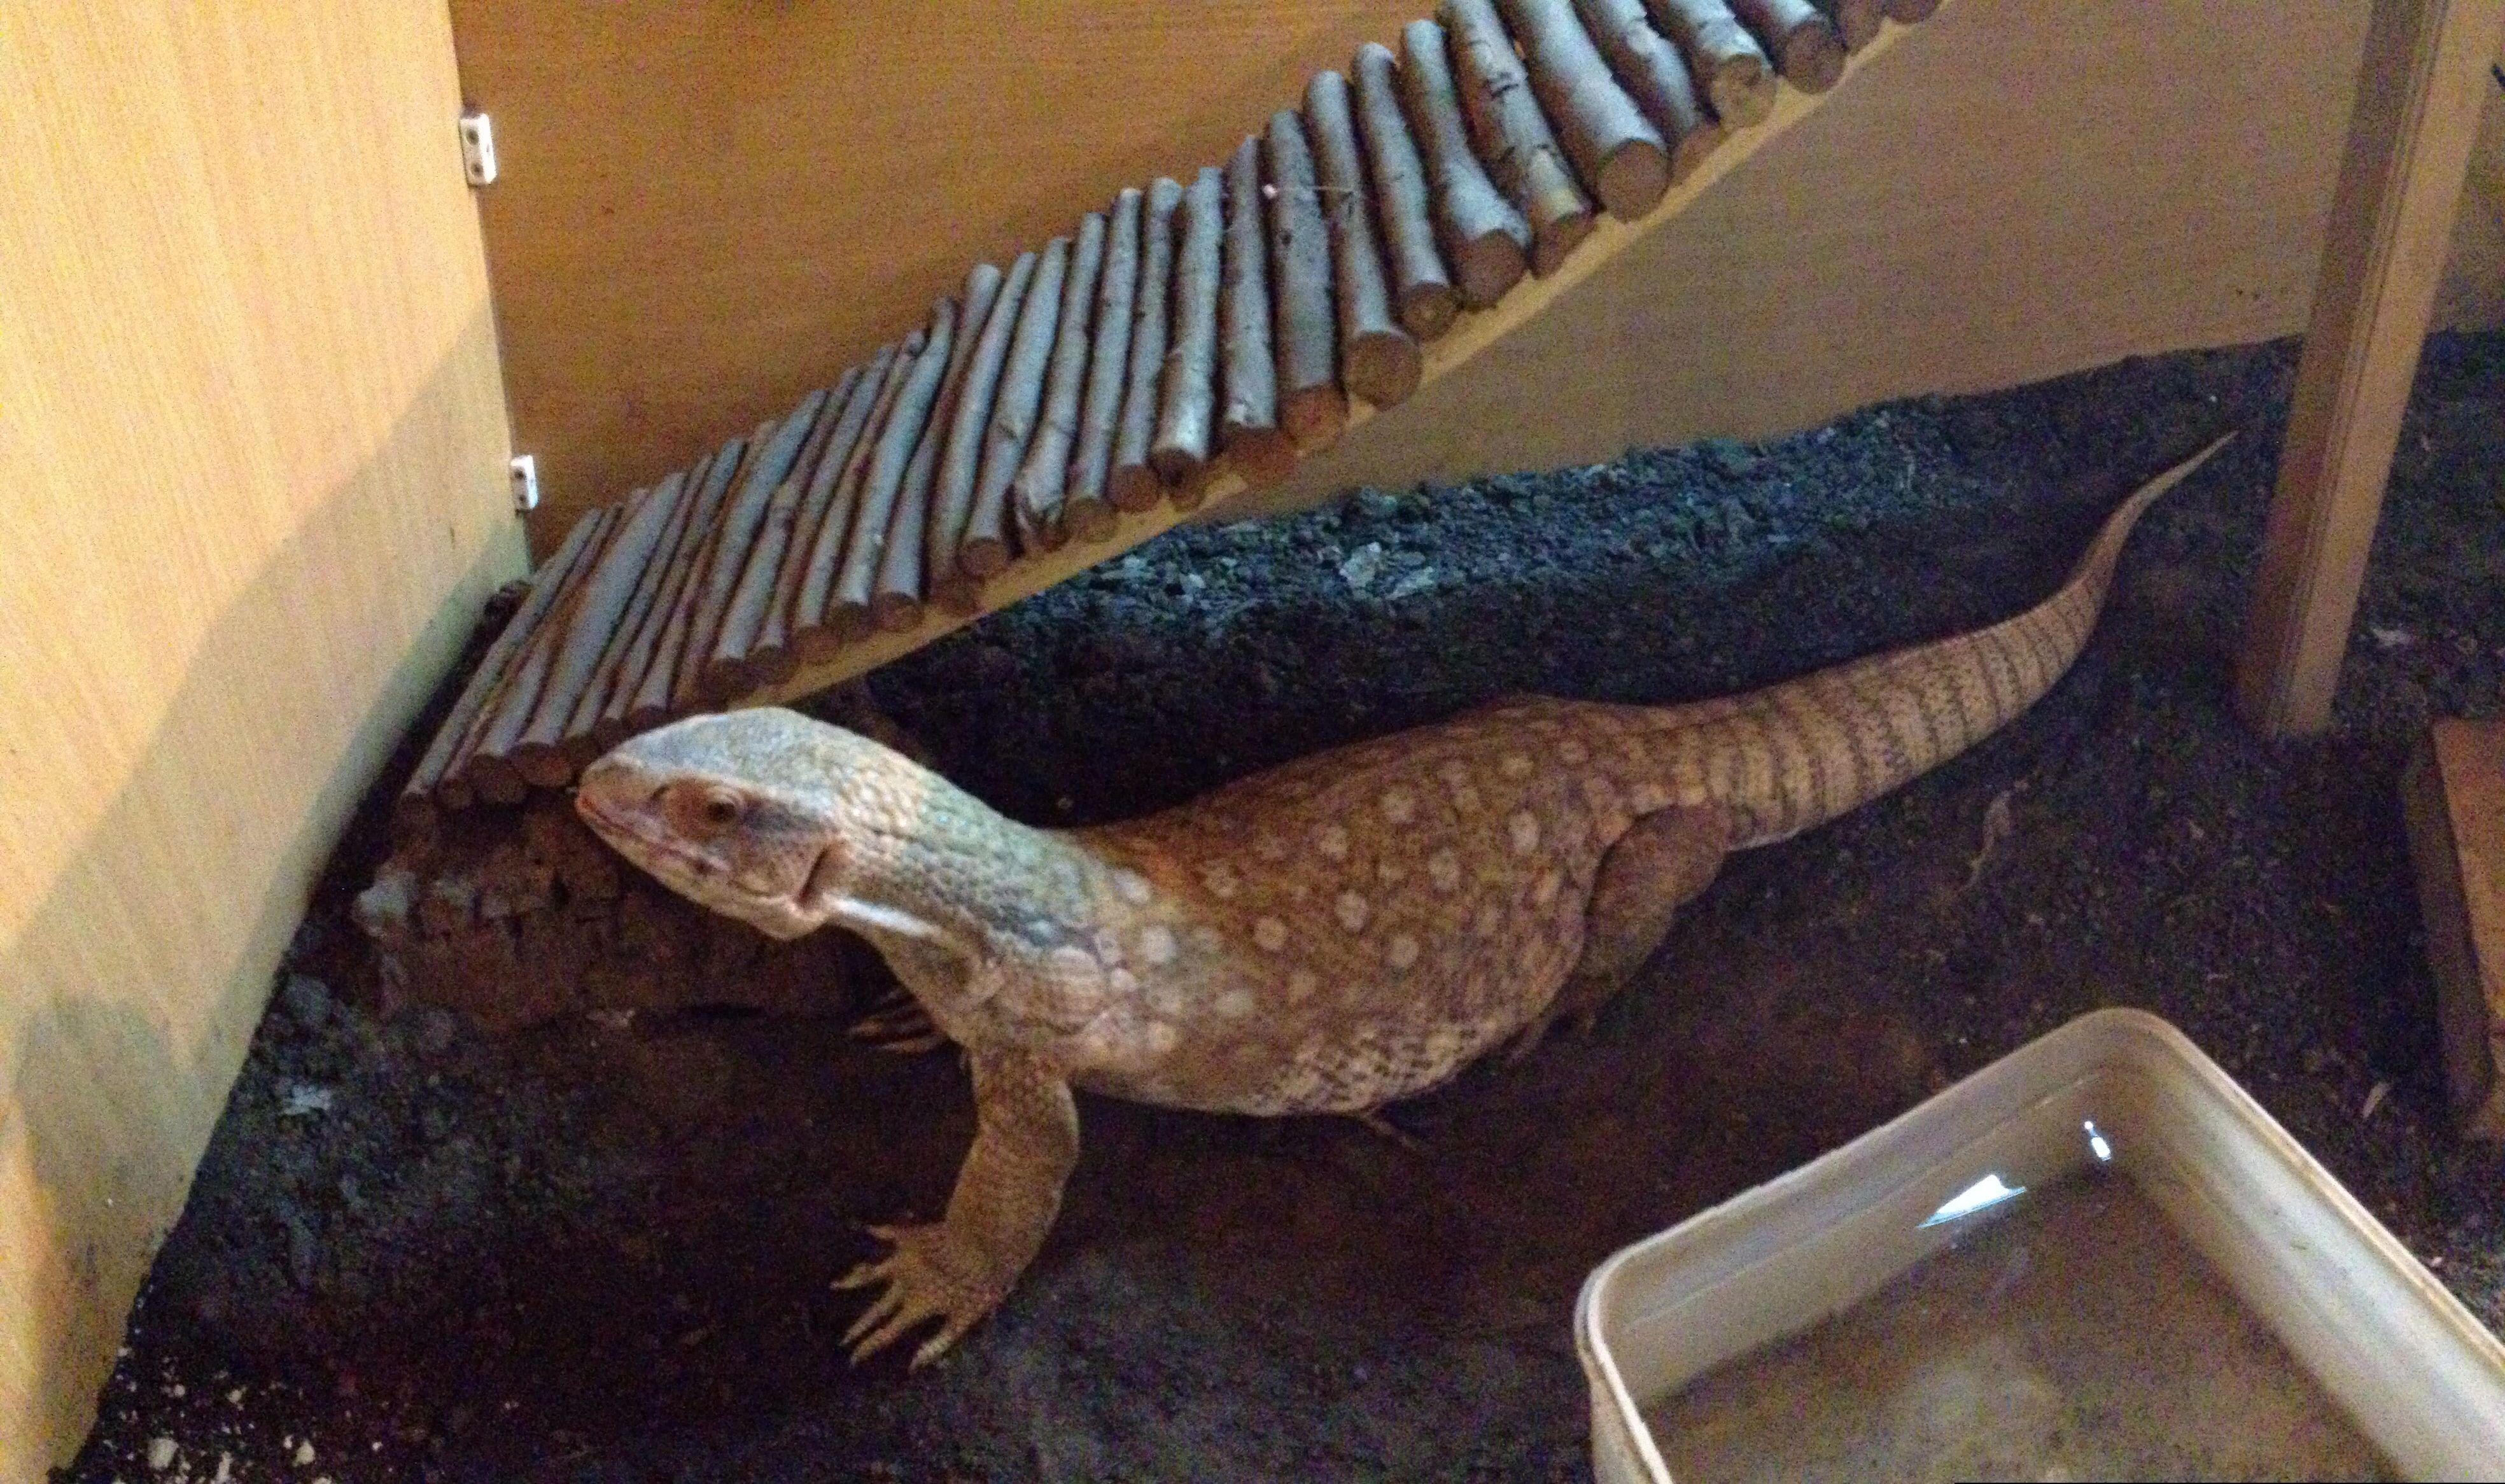 Pin by Brooke Johnson on Reptiles Monitor lizard, Lizard